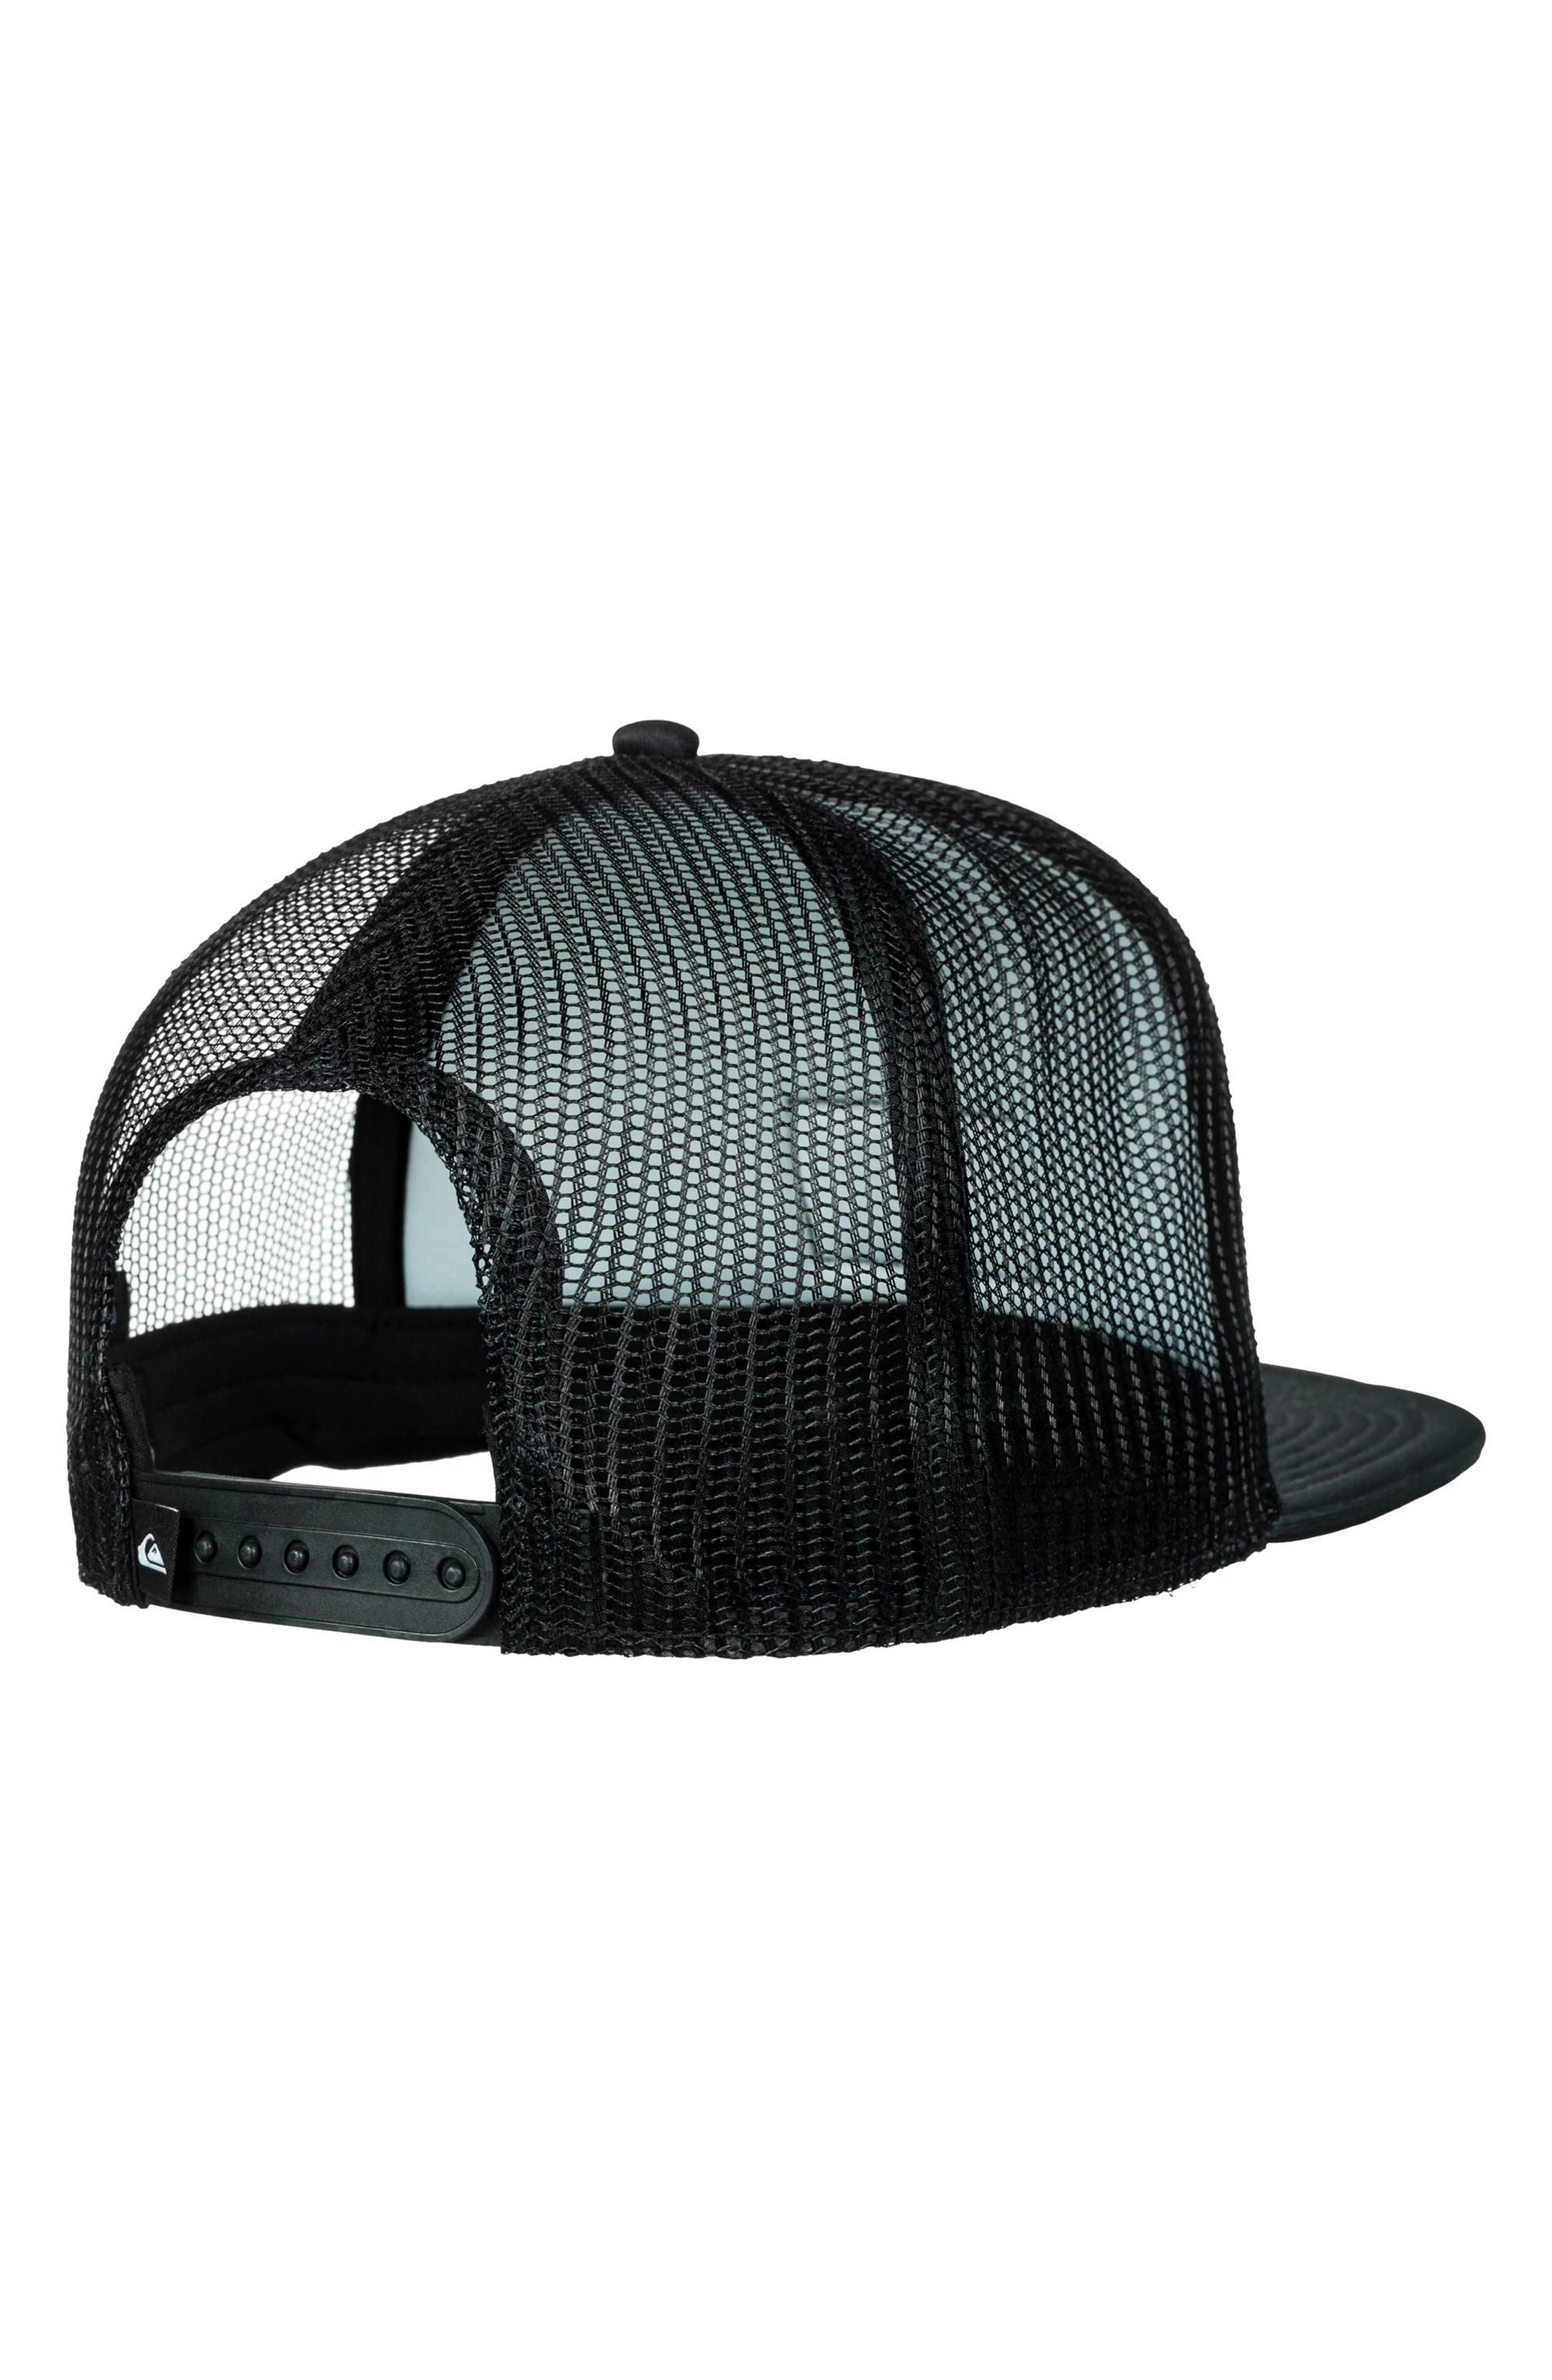 Brissells Trucker Hat,                             Alternate thumbnail 2, color,